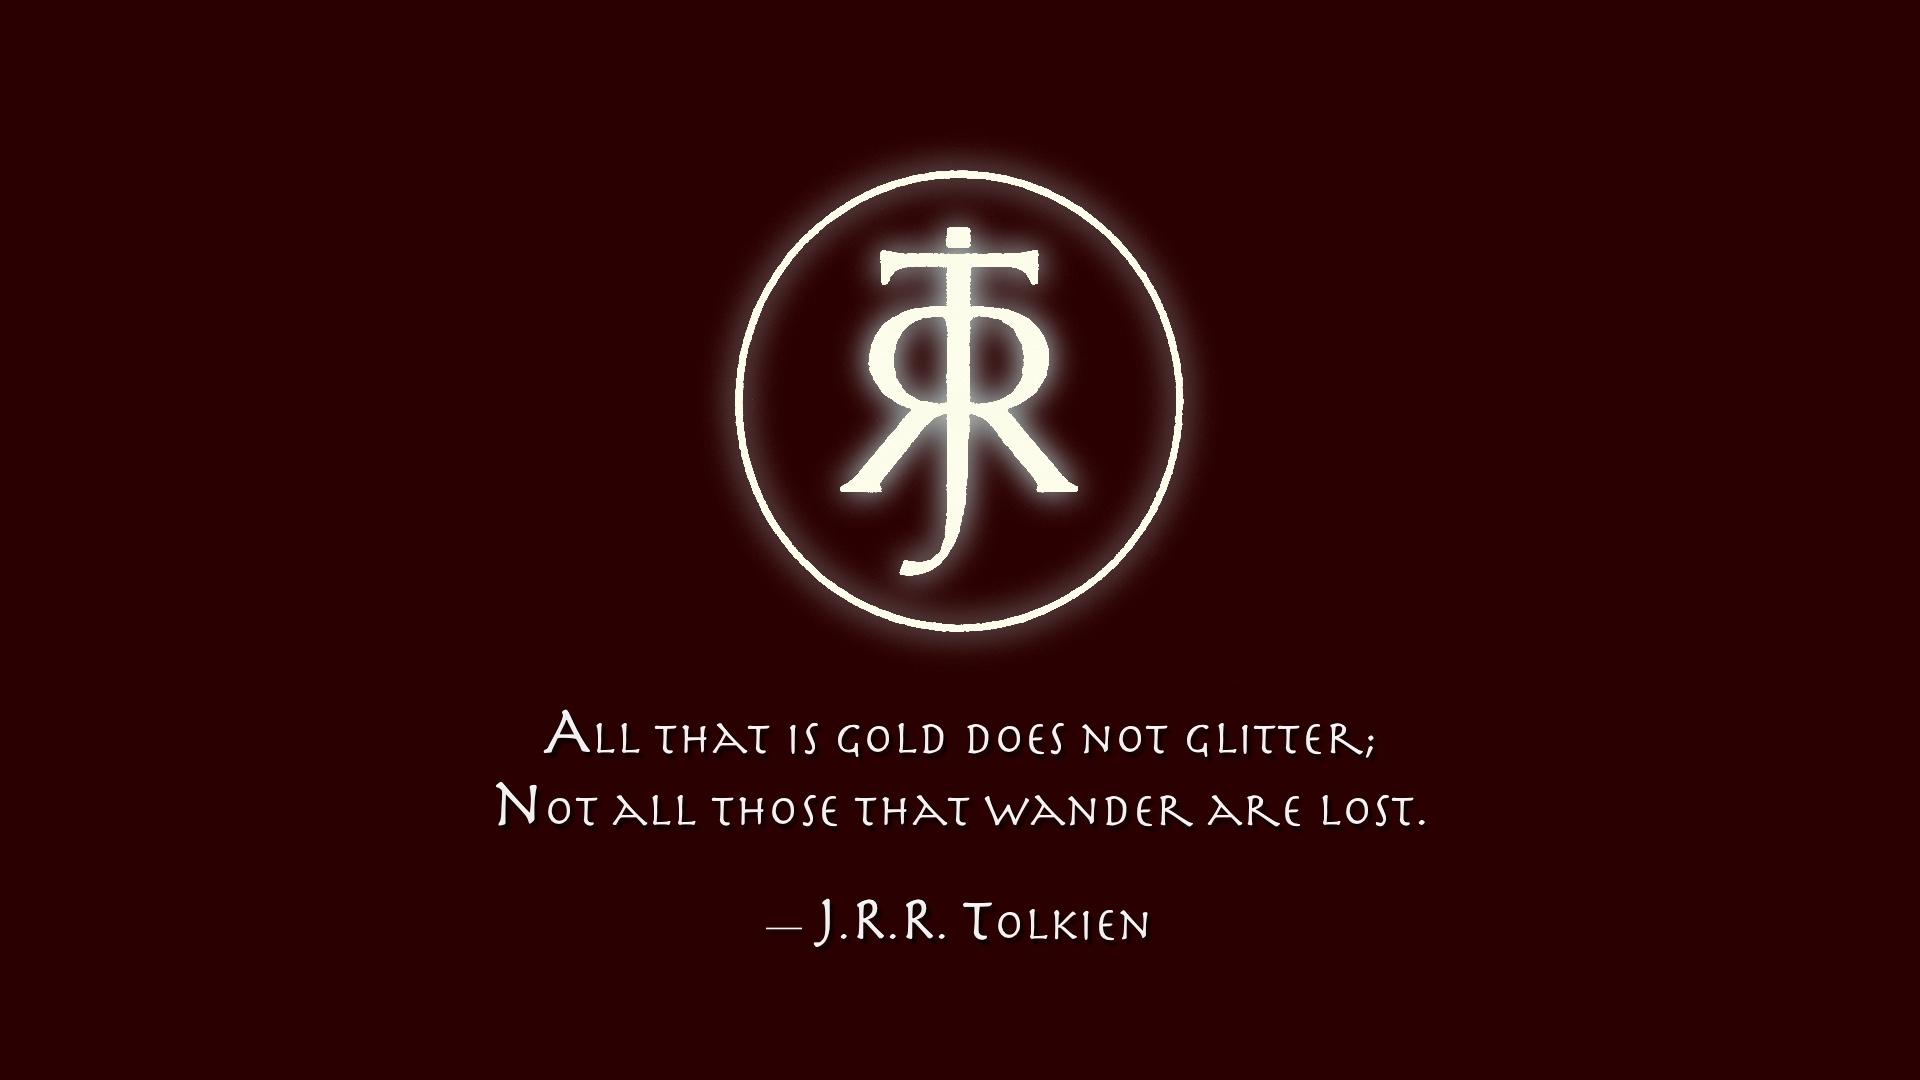 Desktop Wallpaper Tolkien Quote J R R Tolkien Quote Hd Wallpaper Background Image